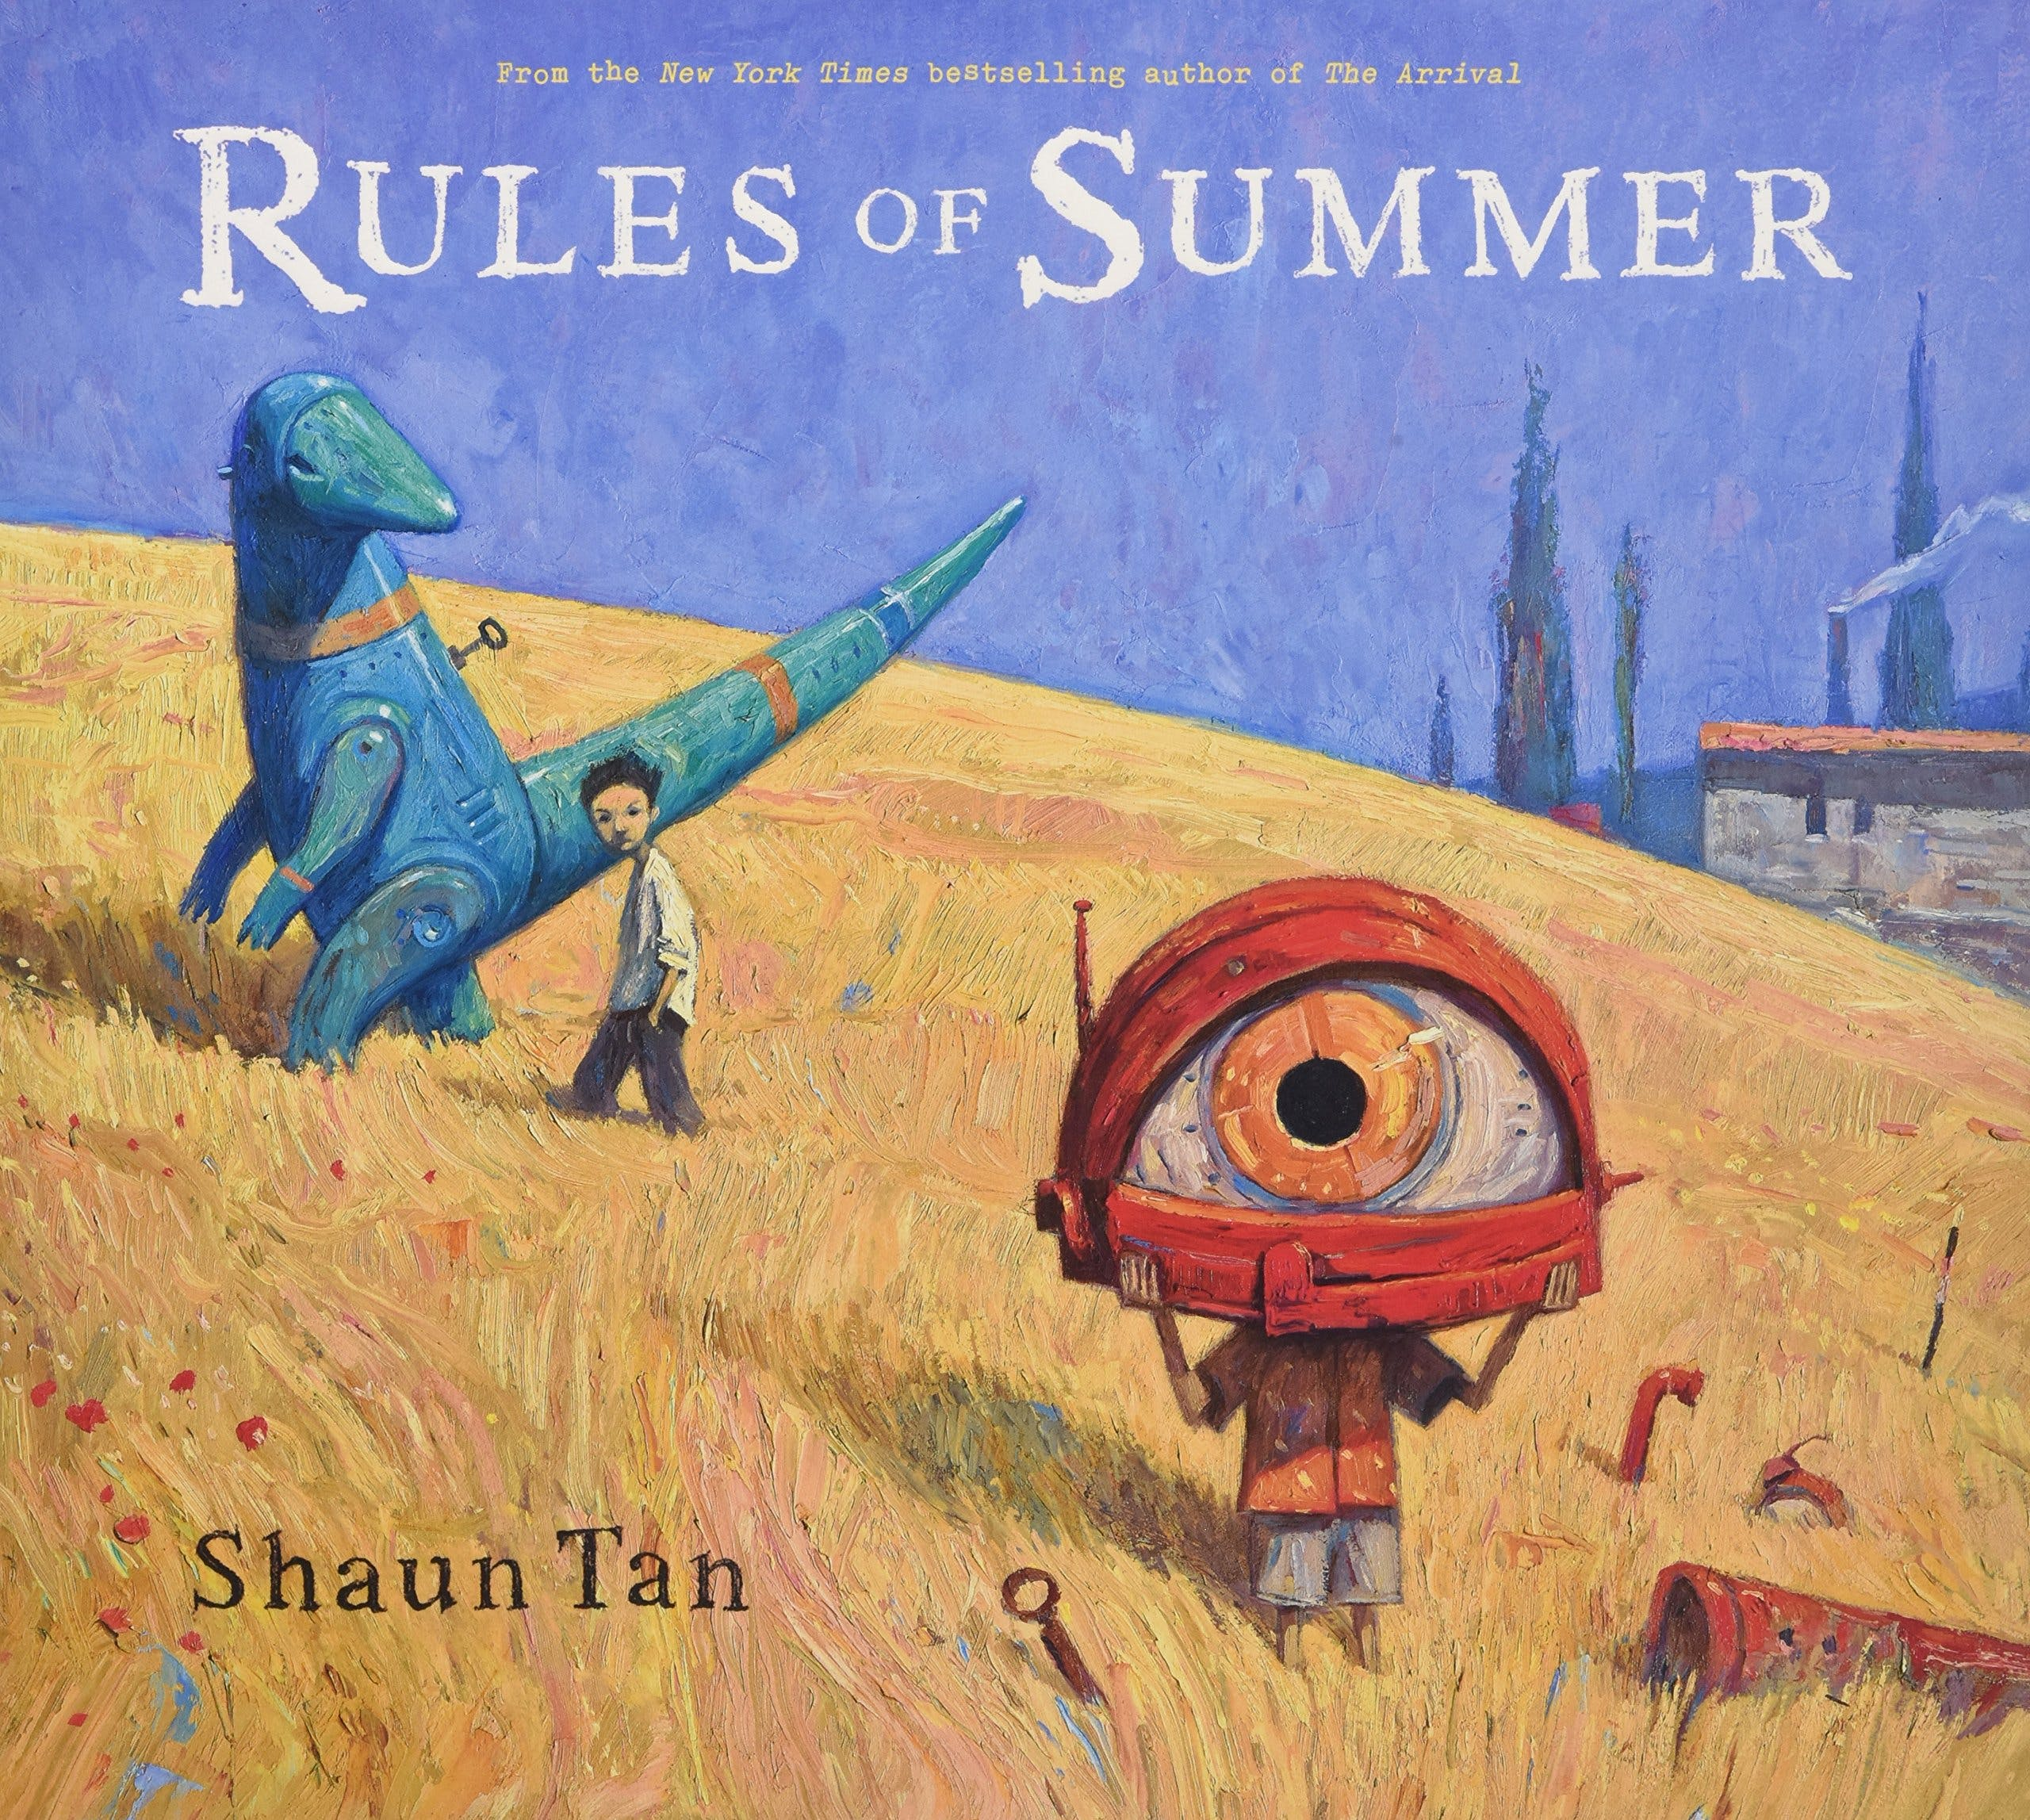 How children's books are still relevant today